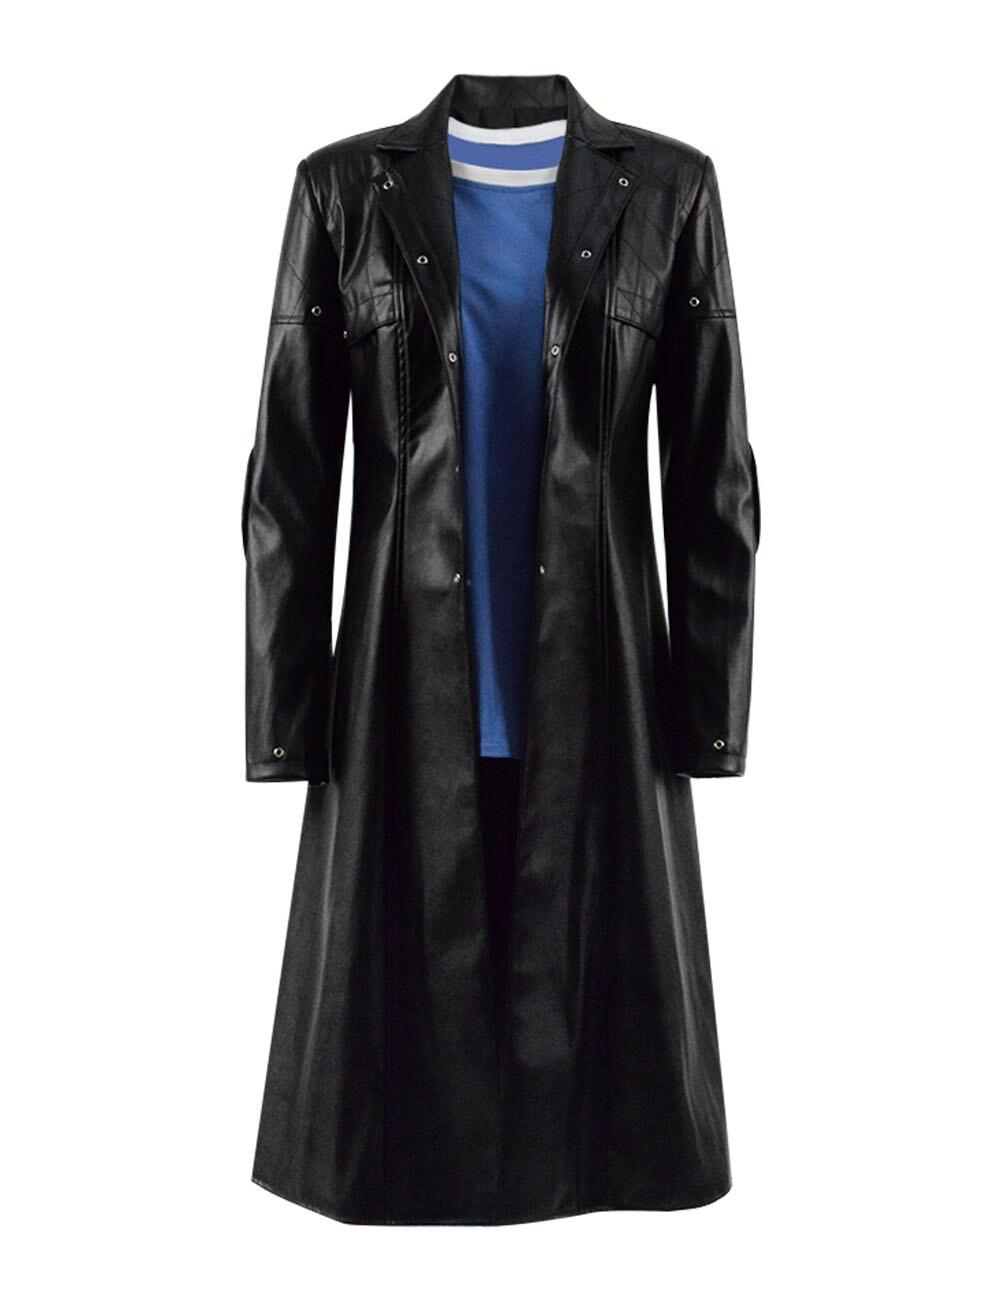 Alita Battle Angel Cosplay Costume Alita T-shirt Black Pu Jacket Women Halloween Cosplay